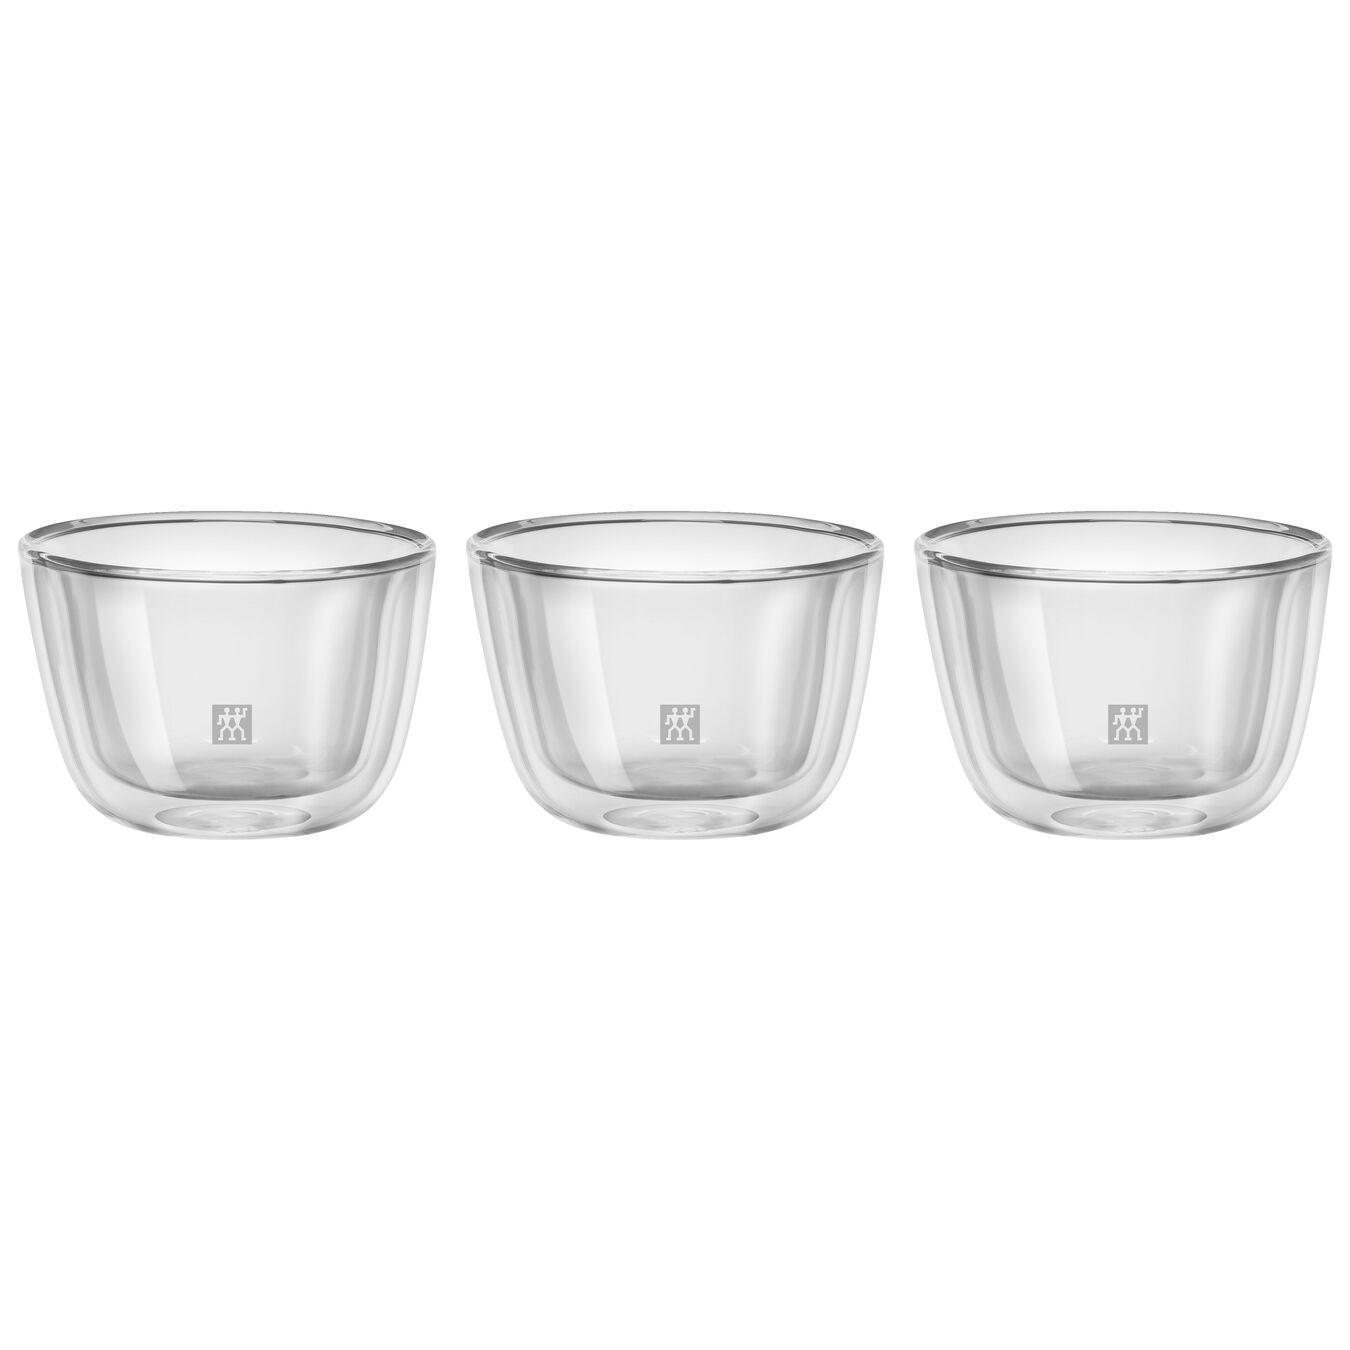 3 PIECE DOUBLE-WALL GLASS TAPAS/APPETIZER BOWL SET,,large 1